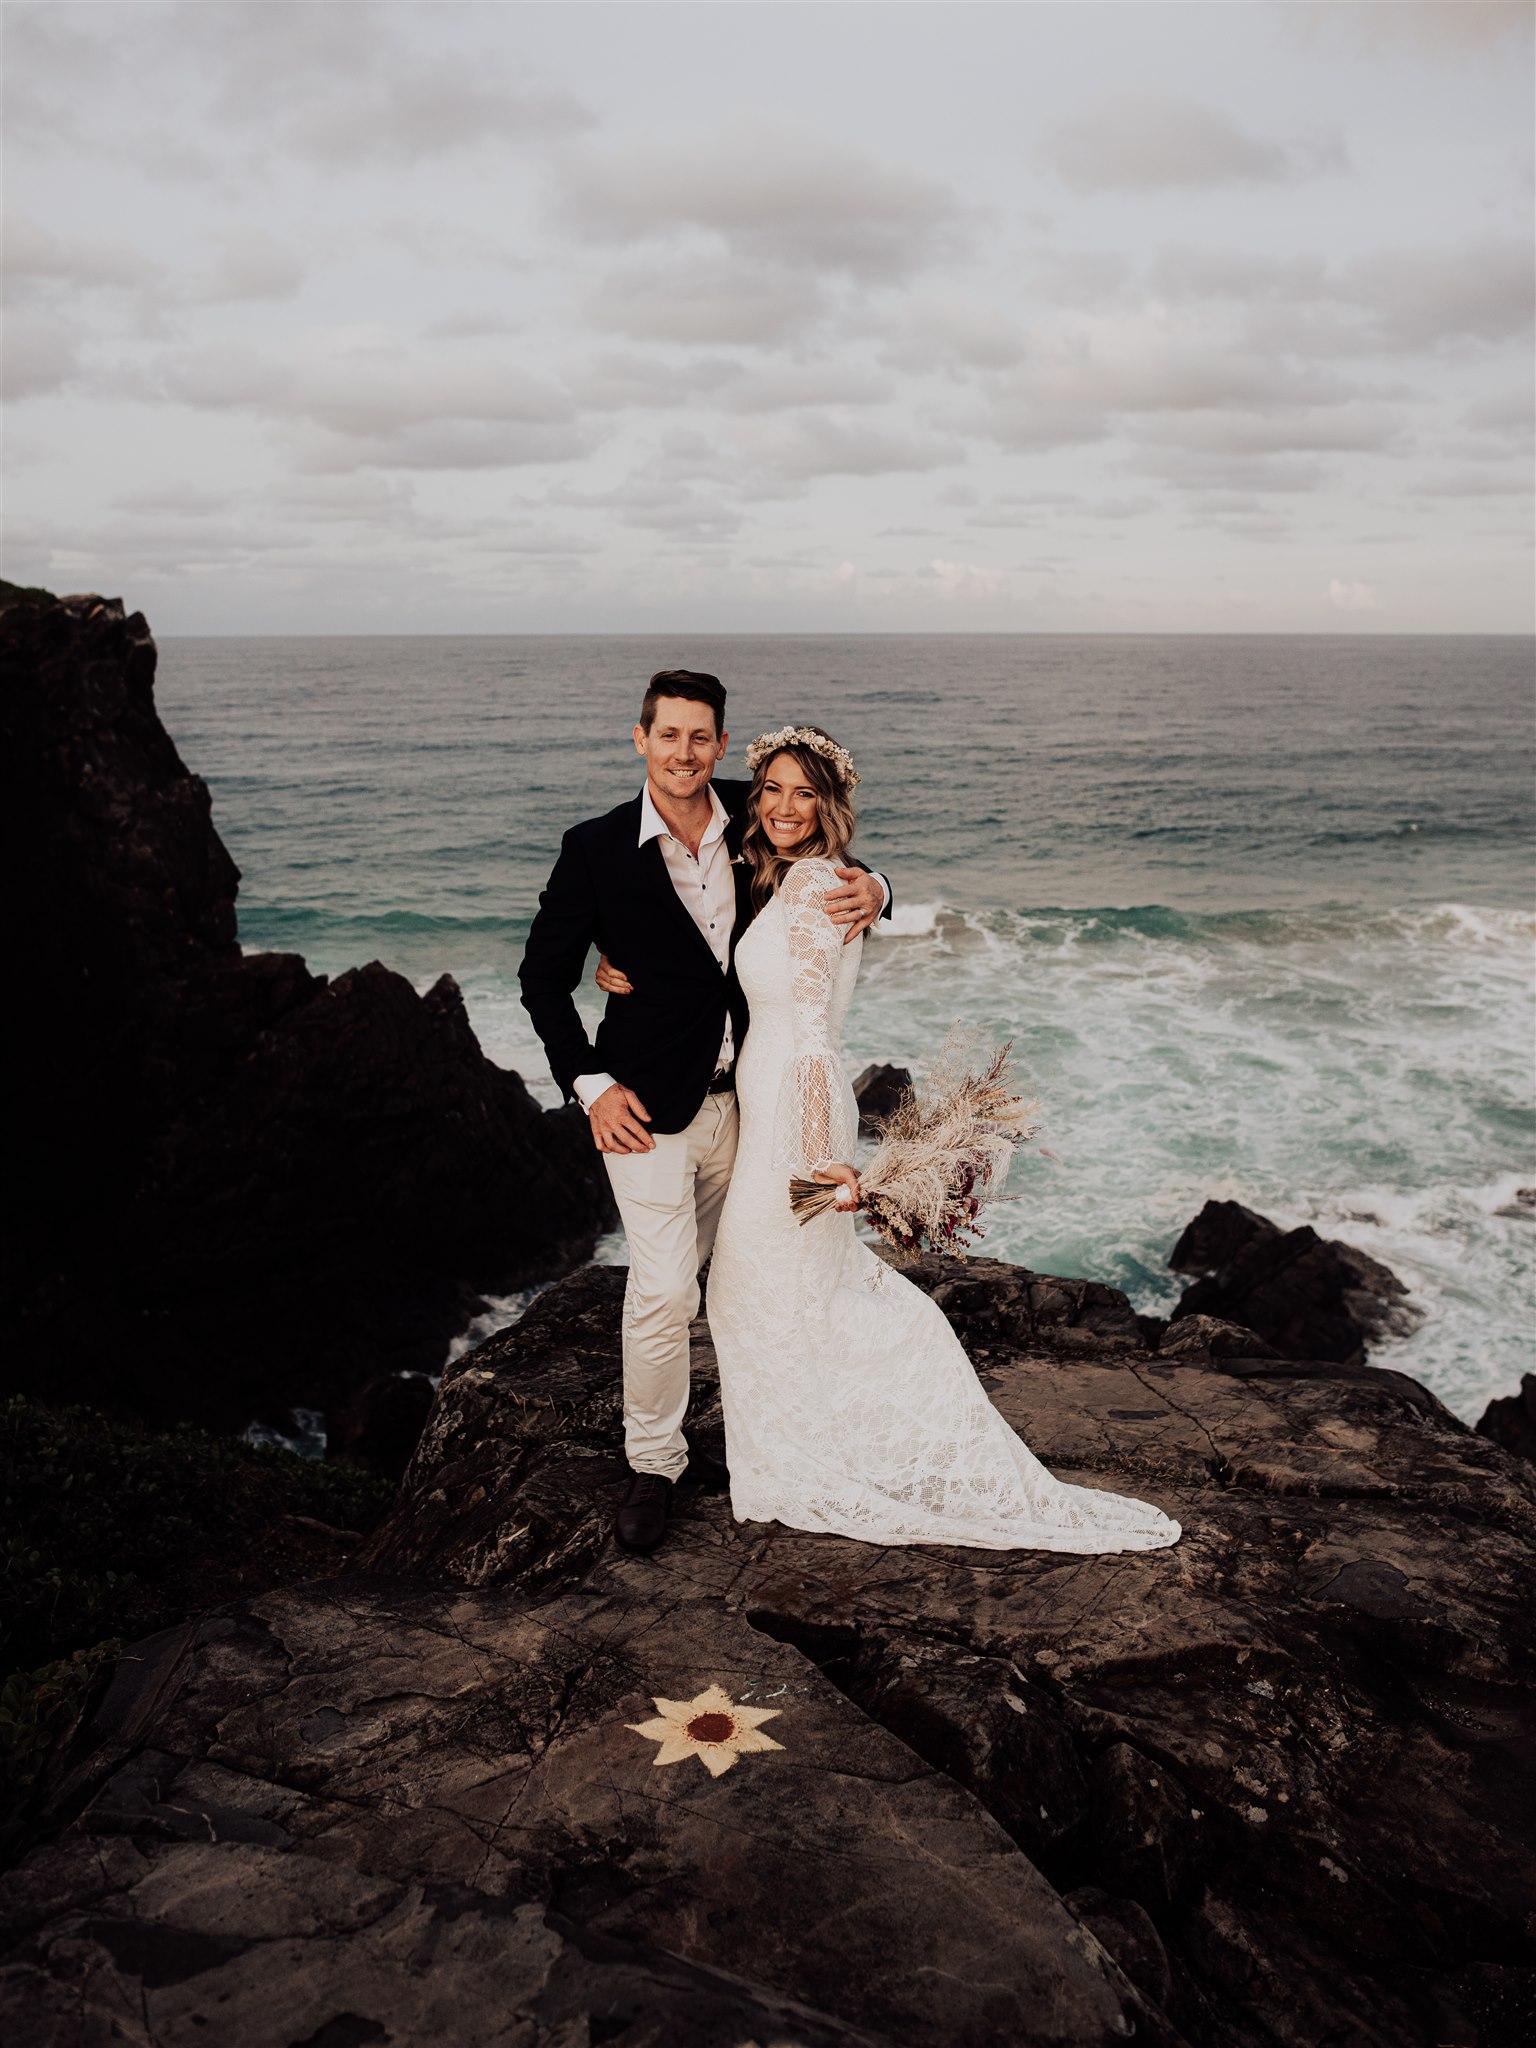 LOVE STORY: LEAH + JOSH   INITIMATE BEACH WEDDING AVEC ZOOM GUESTS CABARITA BEACH NSW